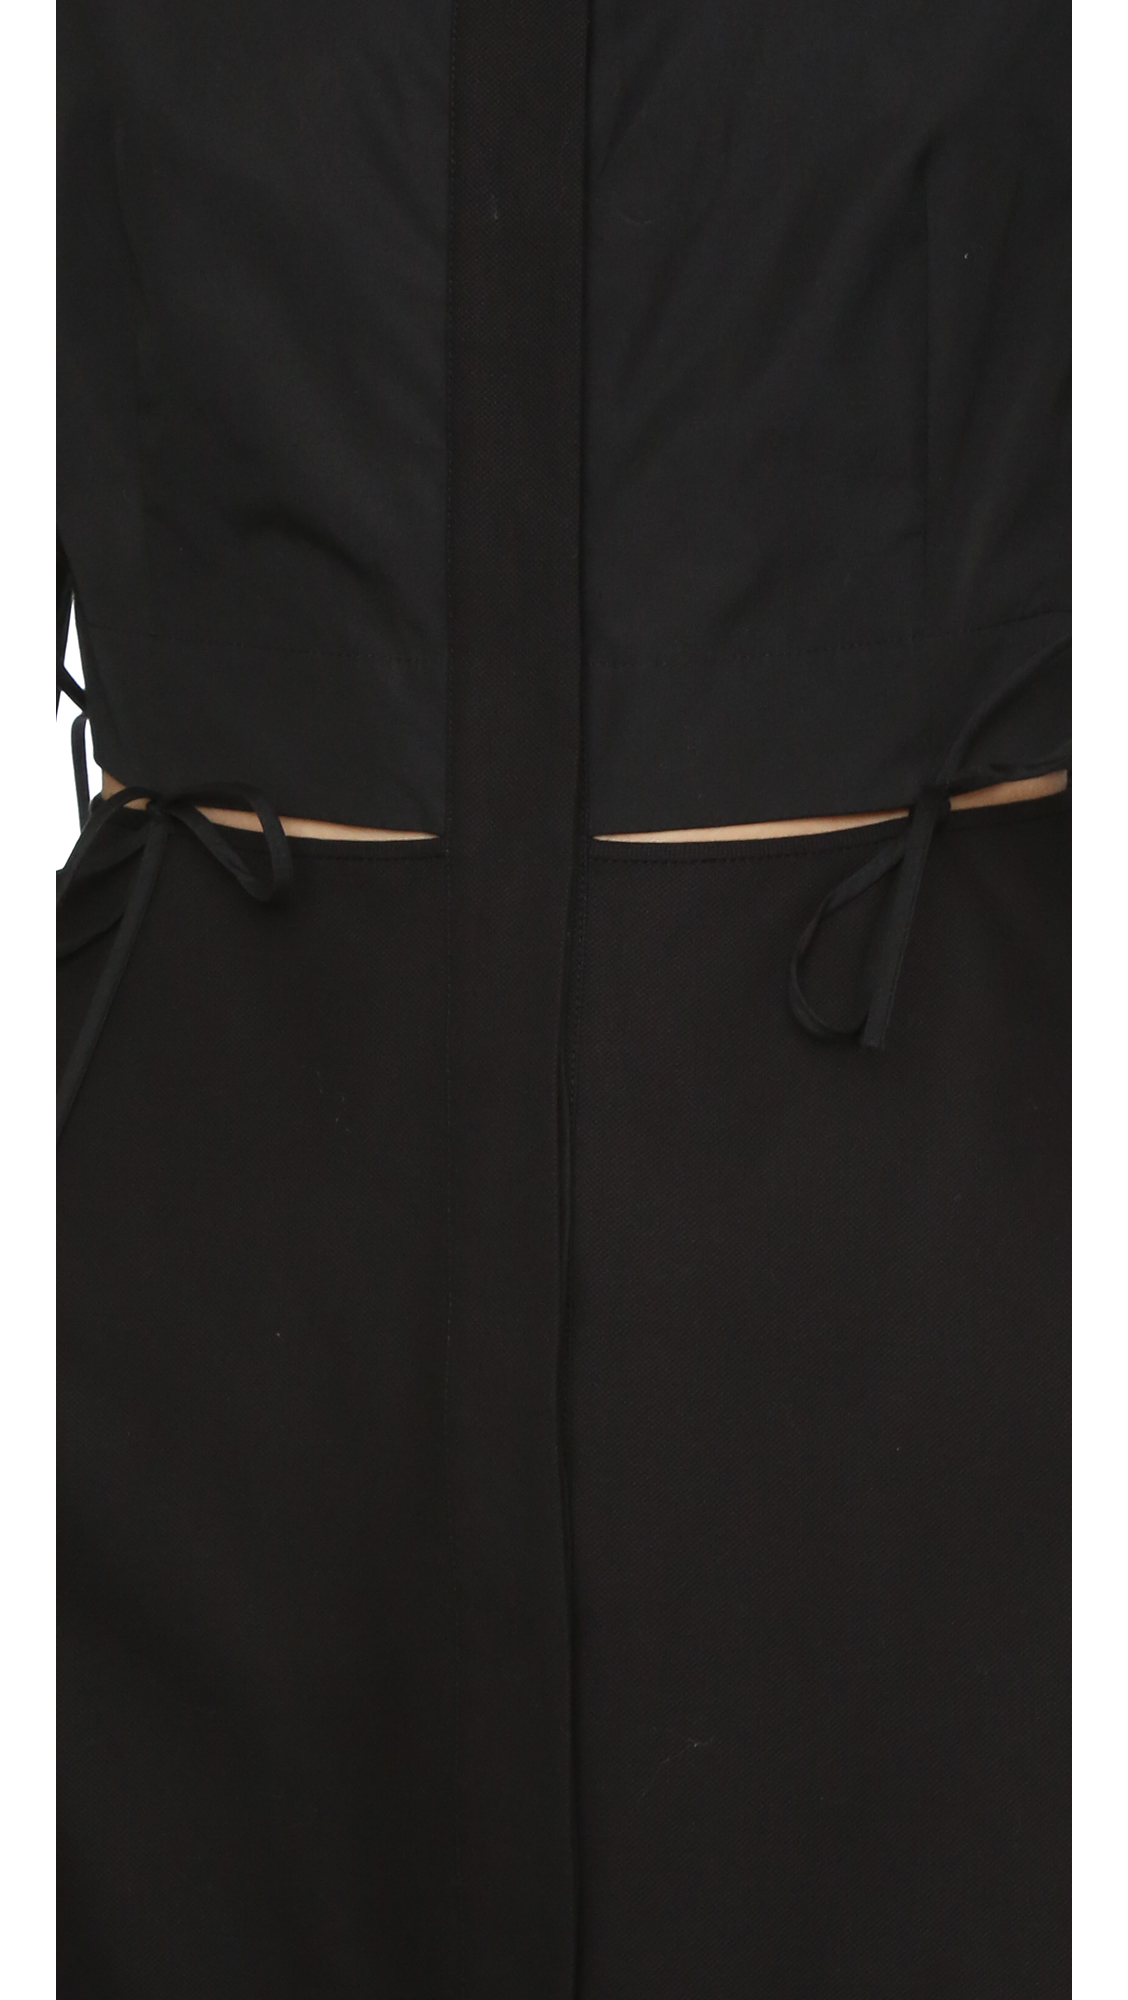 9c39fc00688 Alexander Wang Shirtdress with Binding Tie Detail